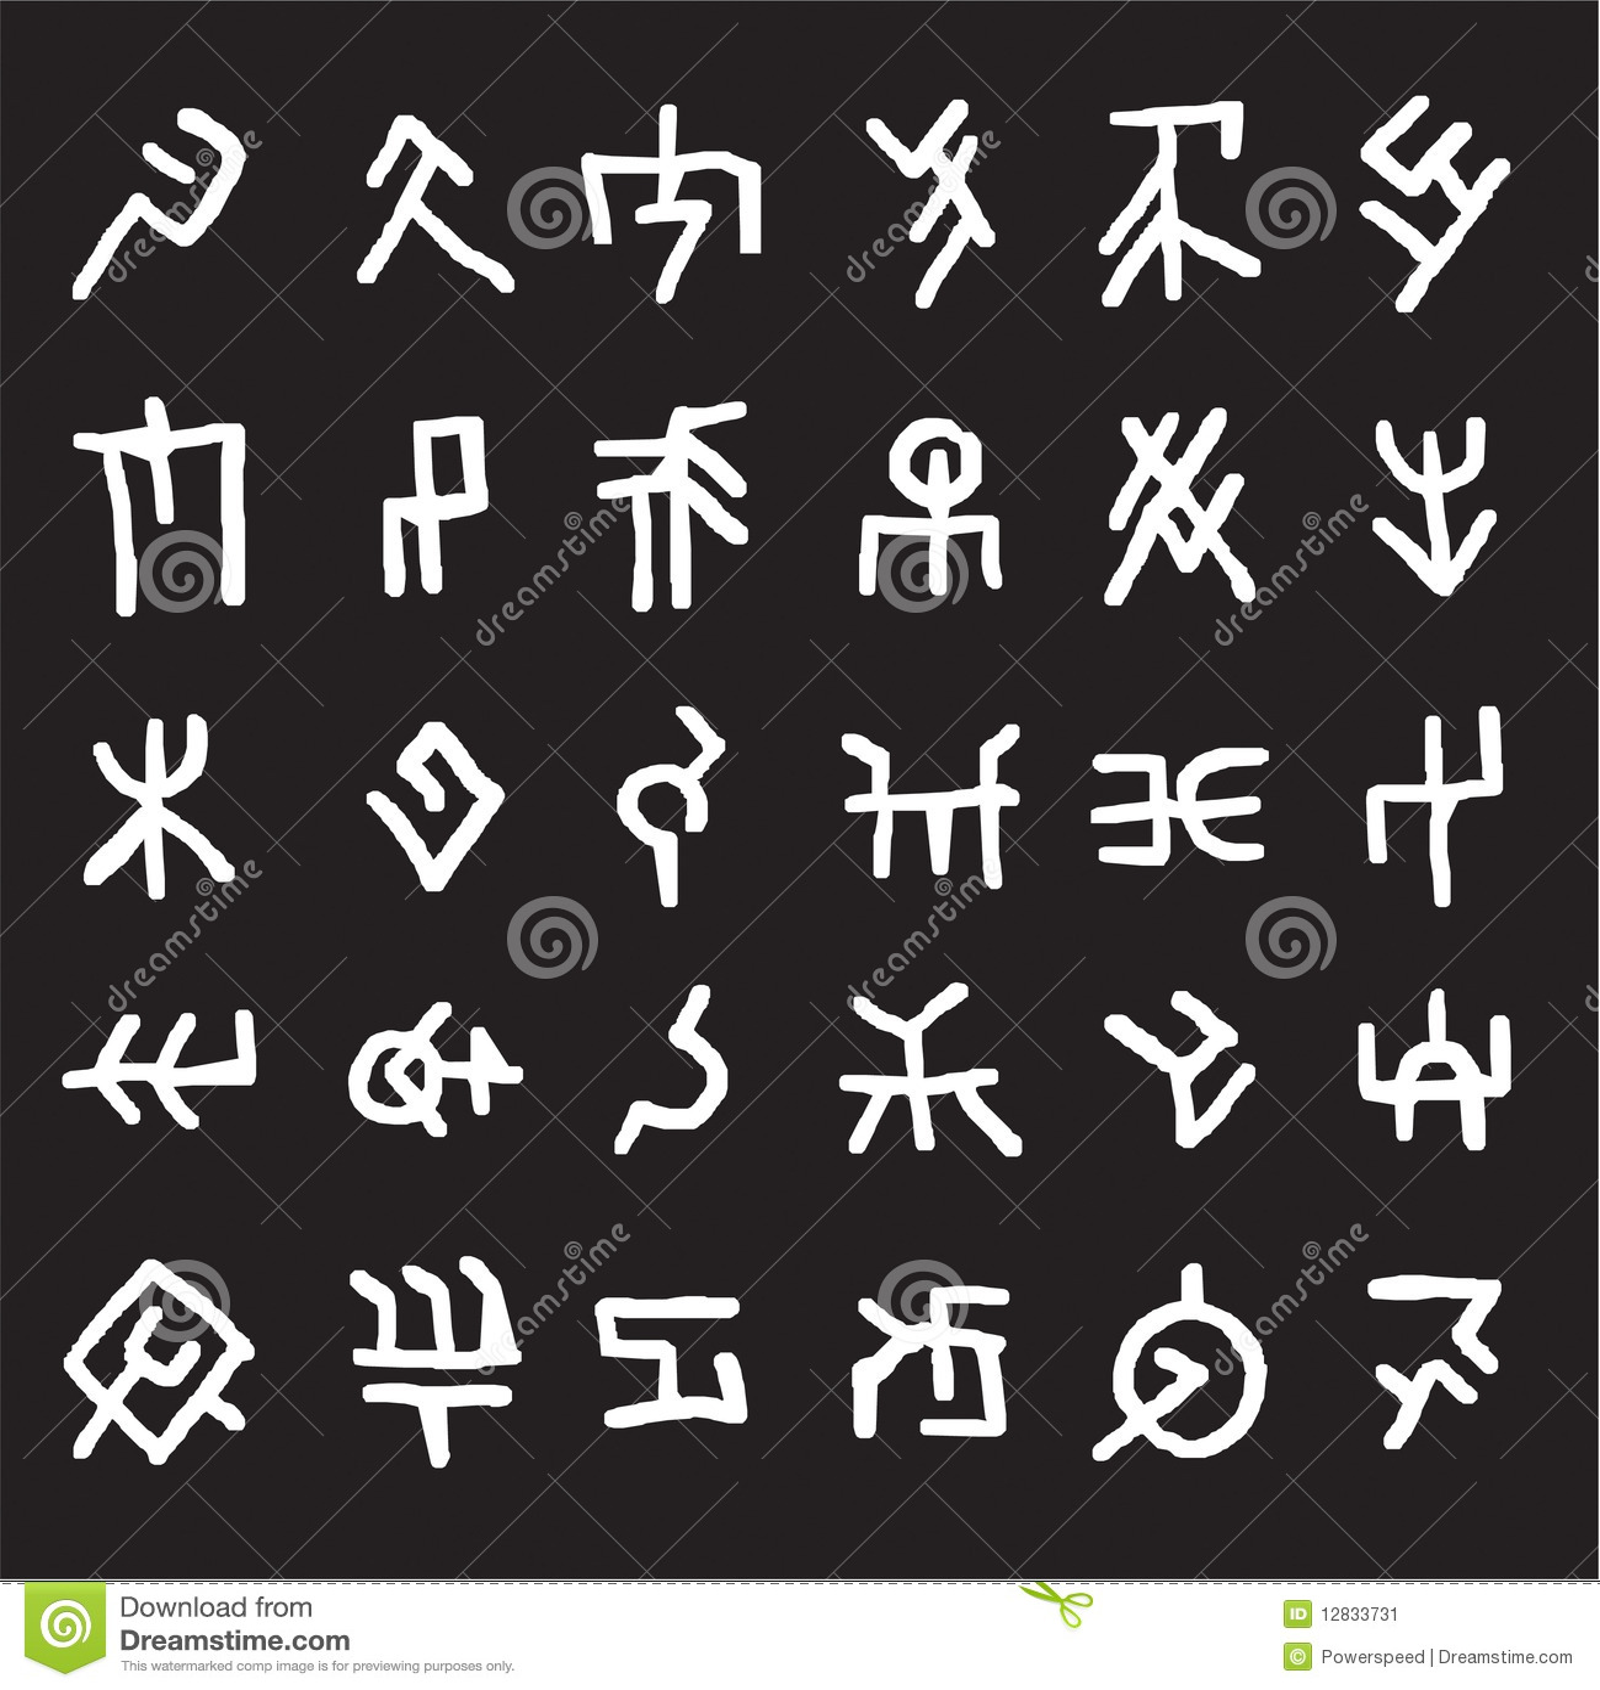 Runes stock illustrations 3837 runes stock illustrations vectors runes vector unreal symbols magic runes witchcraft signs stock image buycottarizona Choice Image